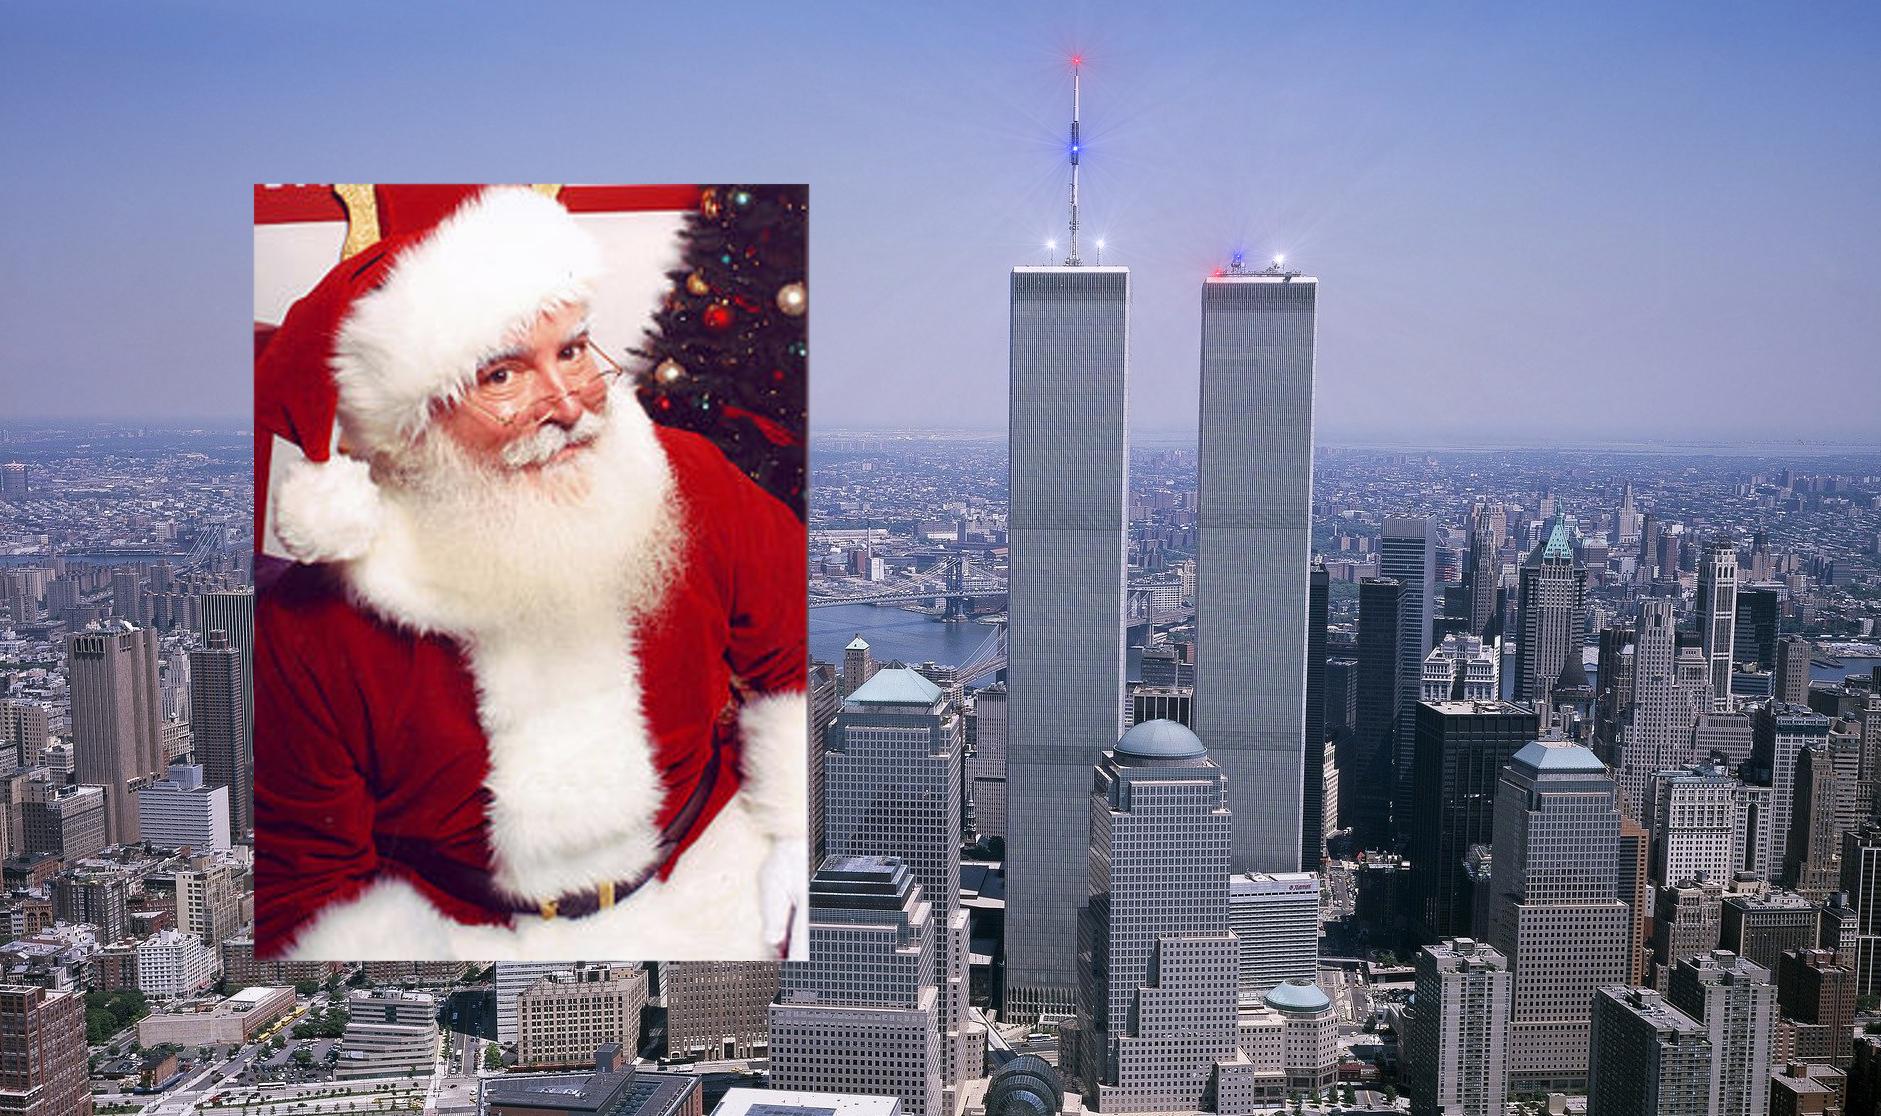 Santa Claus Was At Ground Zero During September 11th Attacks